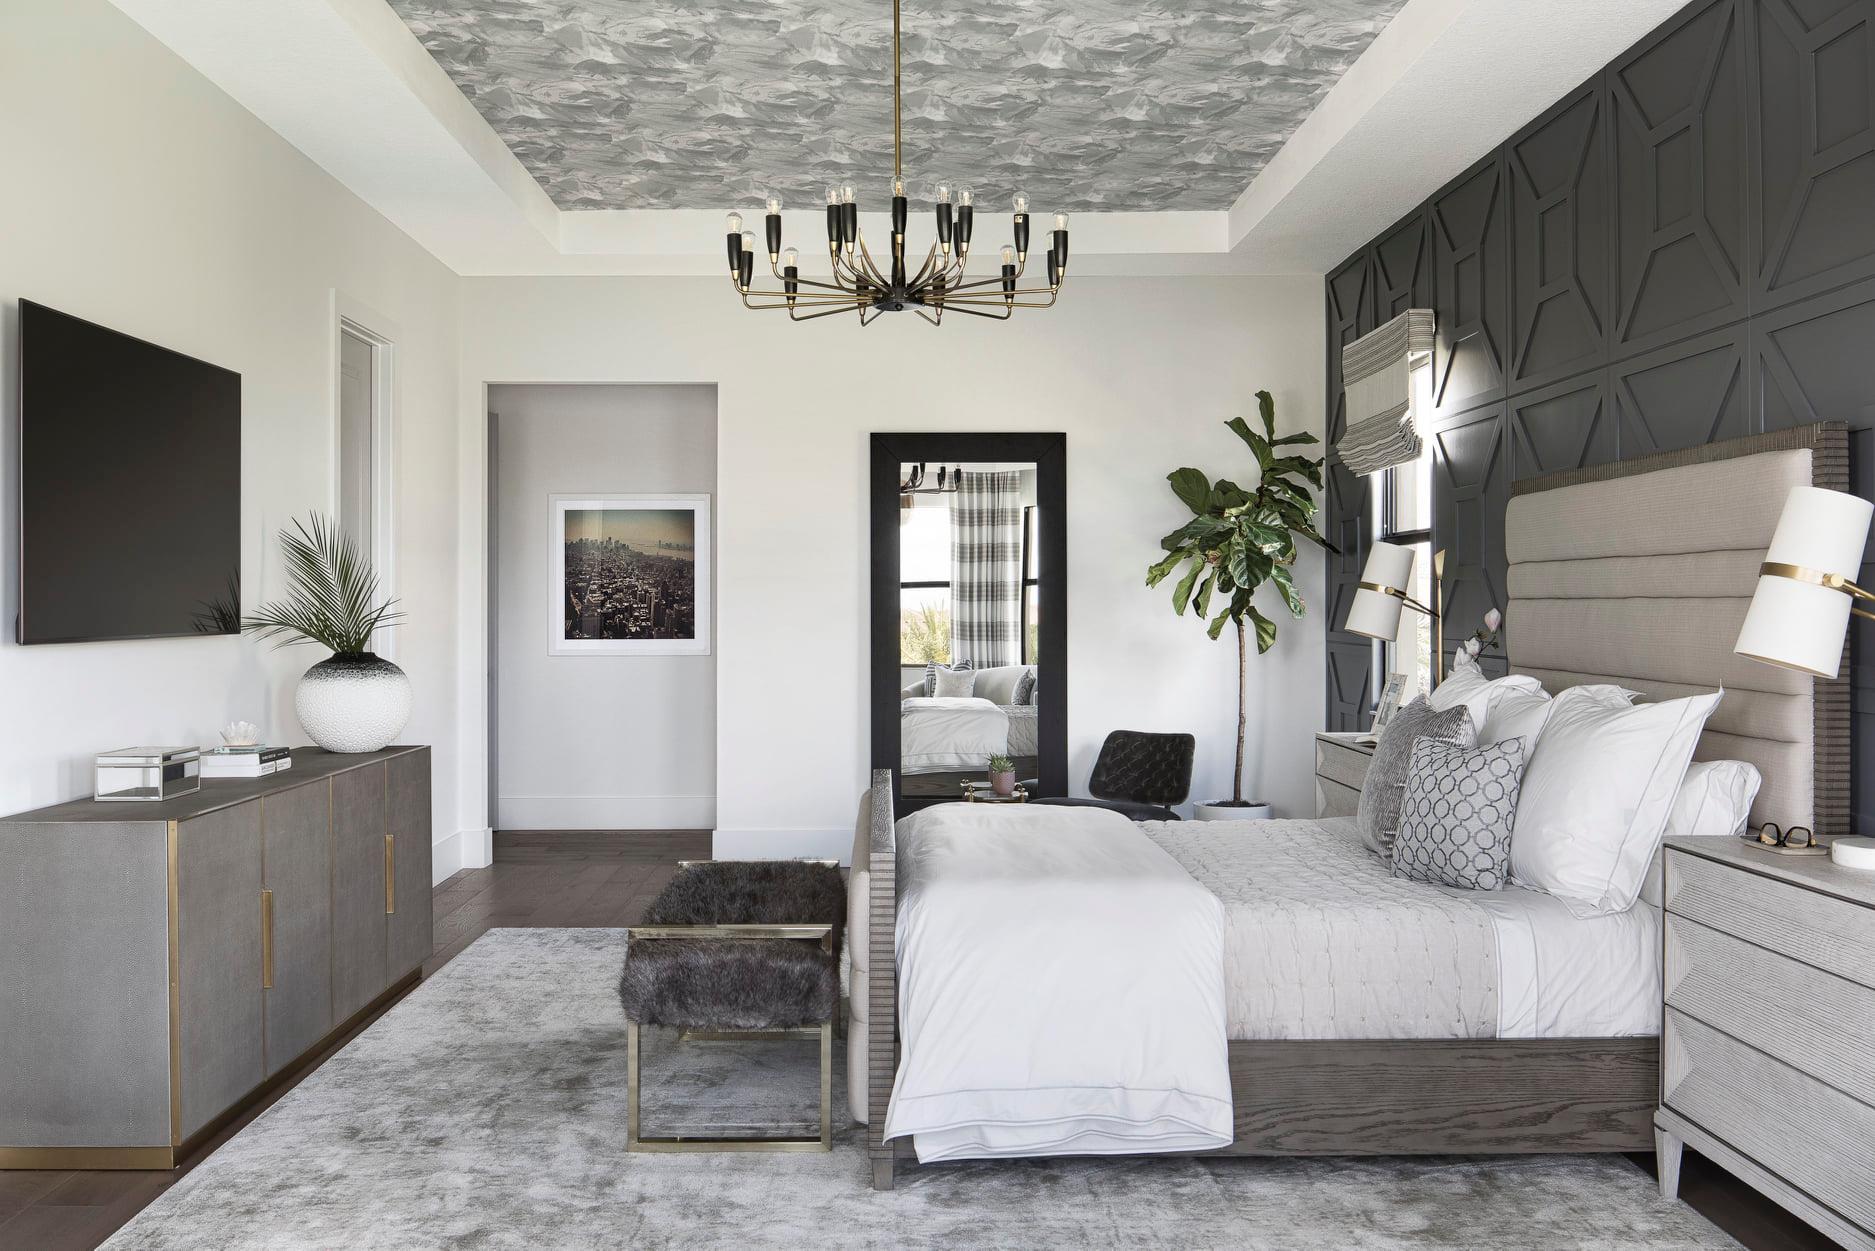 Modern Rustic Master Bedroom - Krista + Home